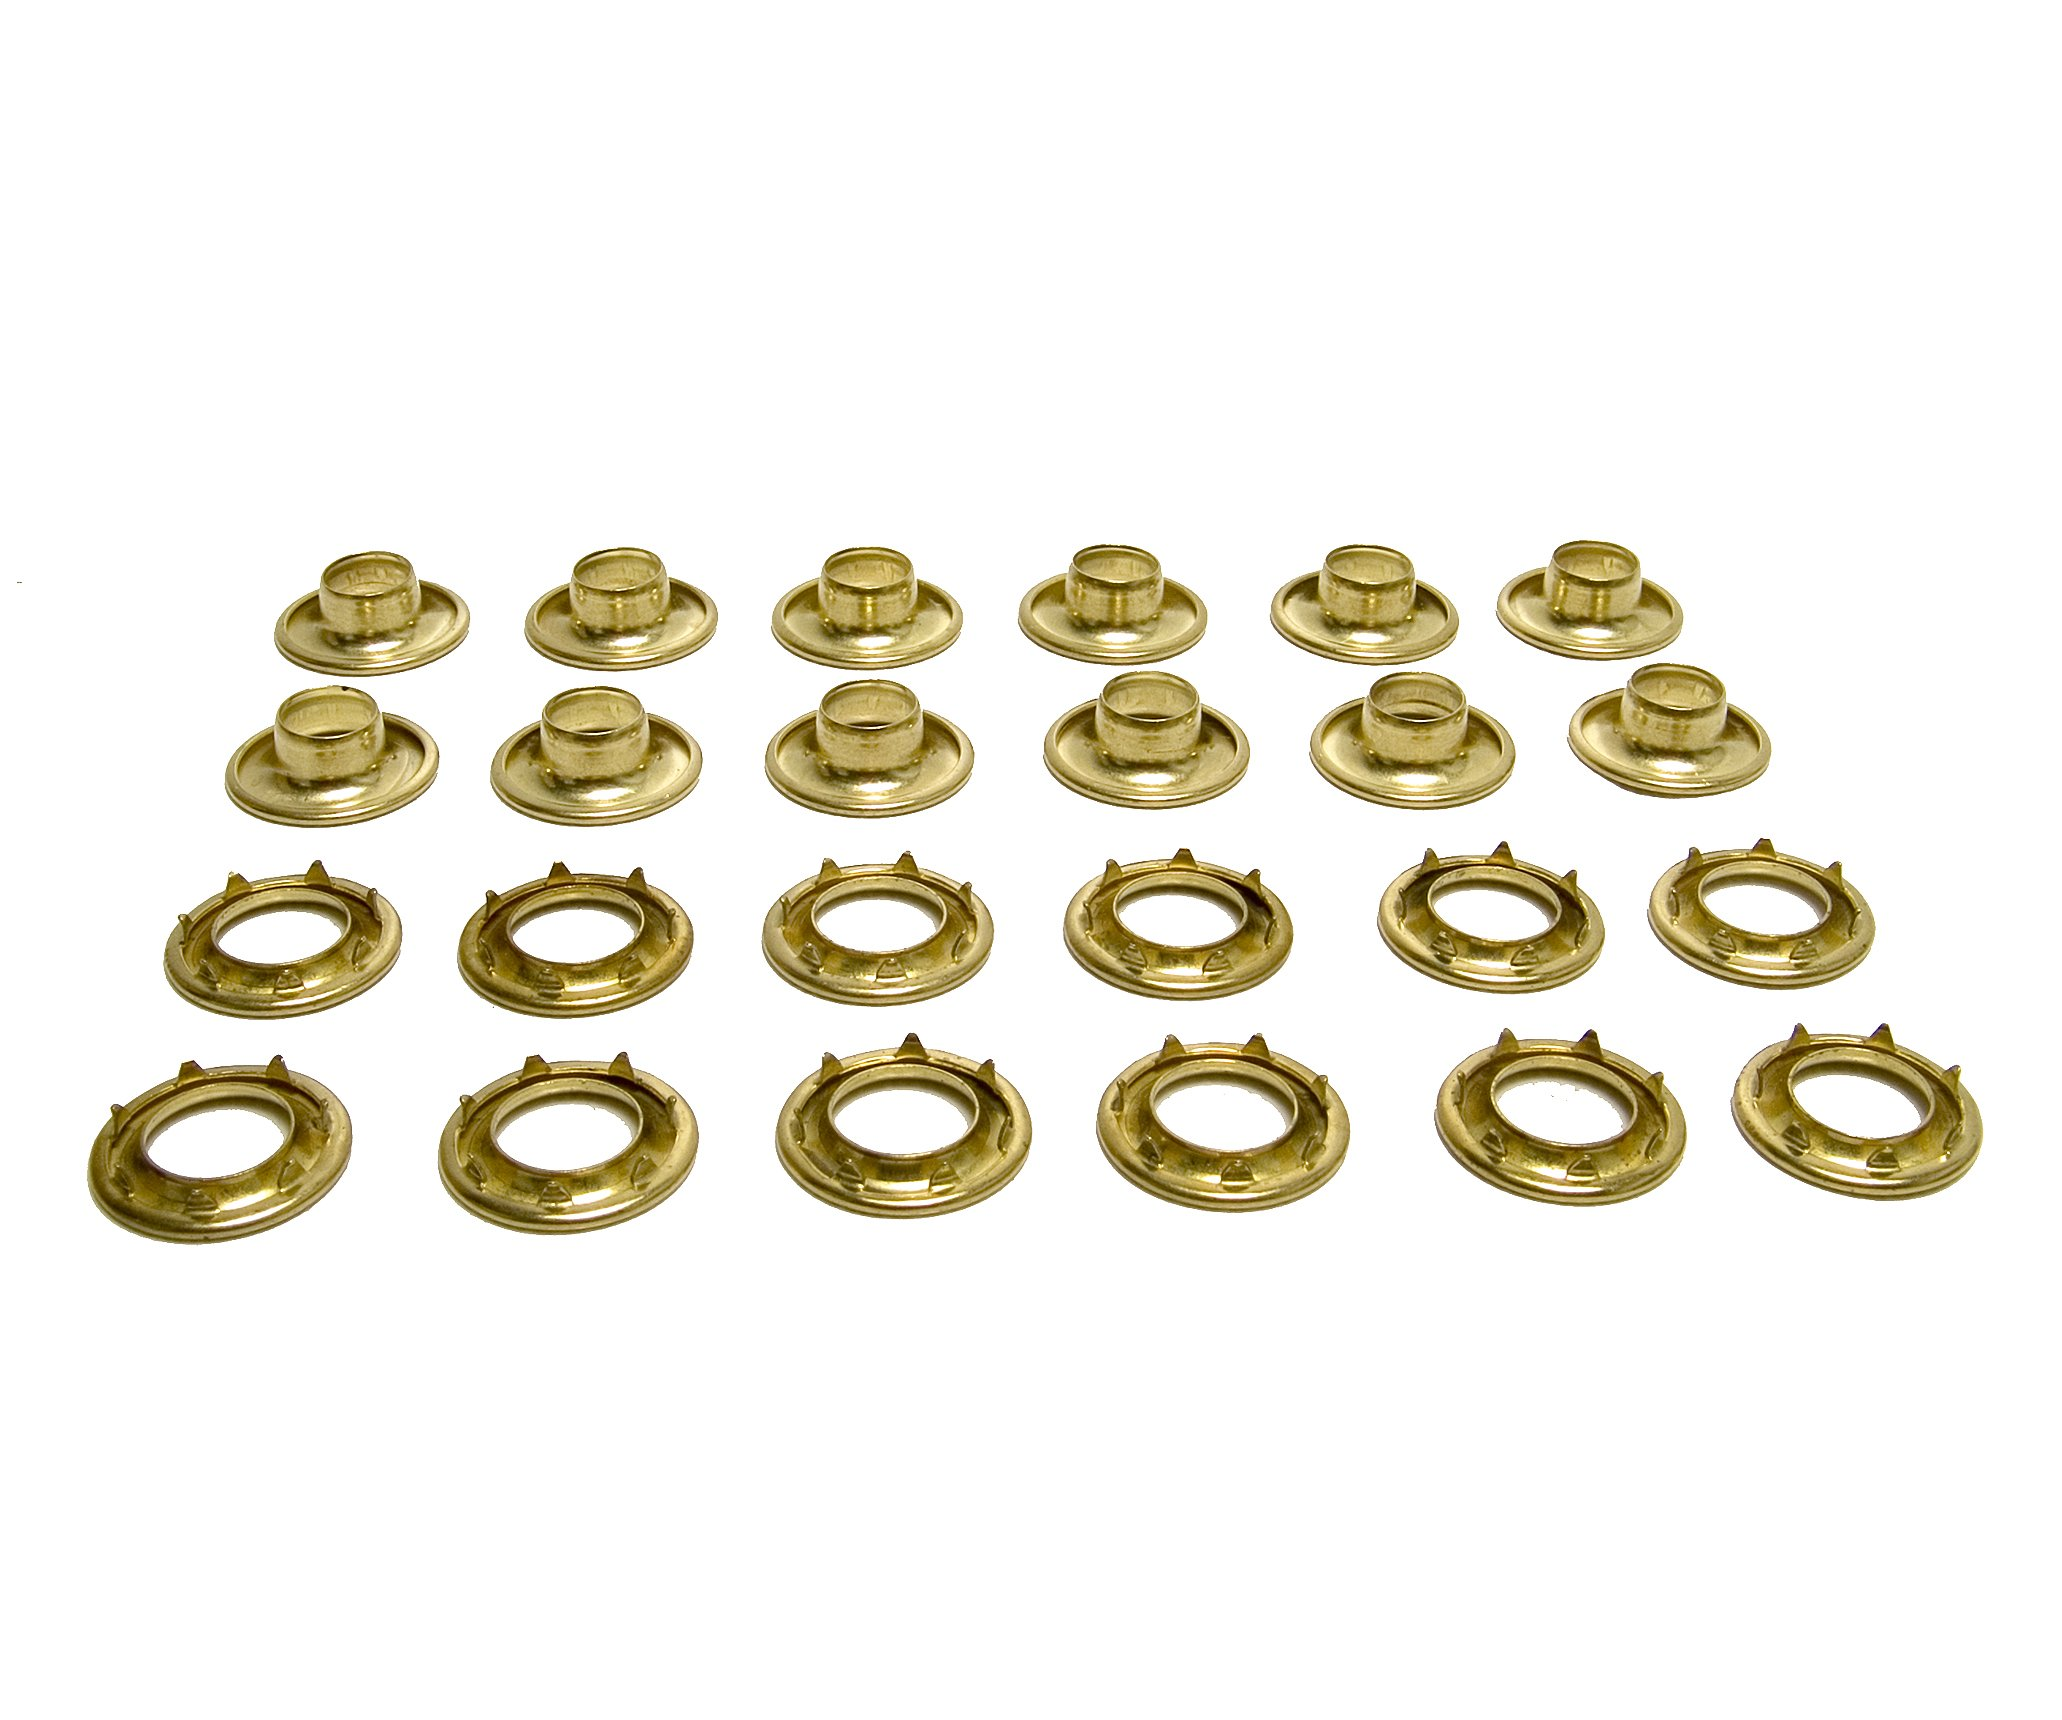 C.S. Osborne Grommets, 3 Brass, Heavy Duty Rolled Rim Spur, 15/32'' Inch Hole